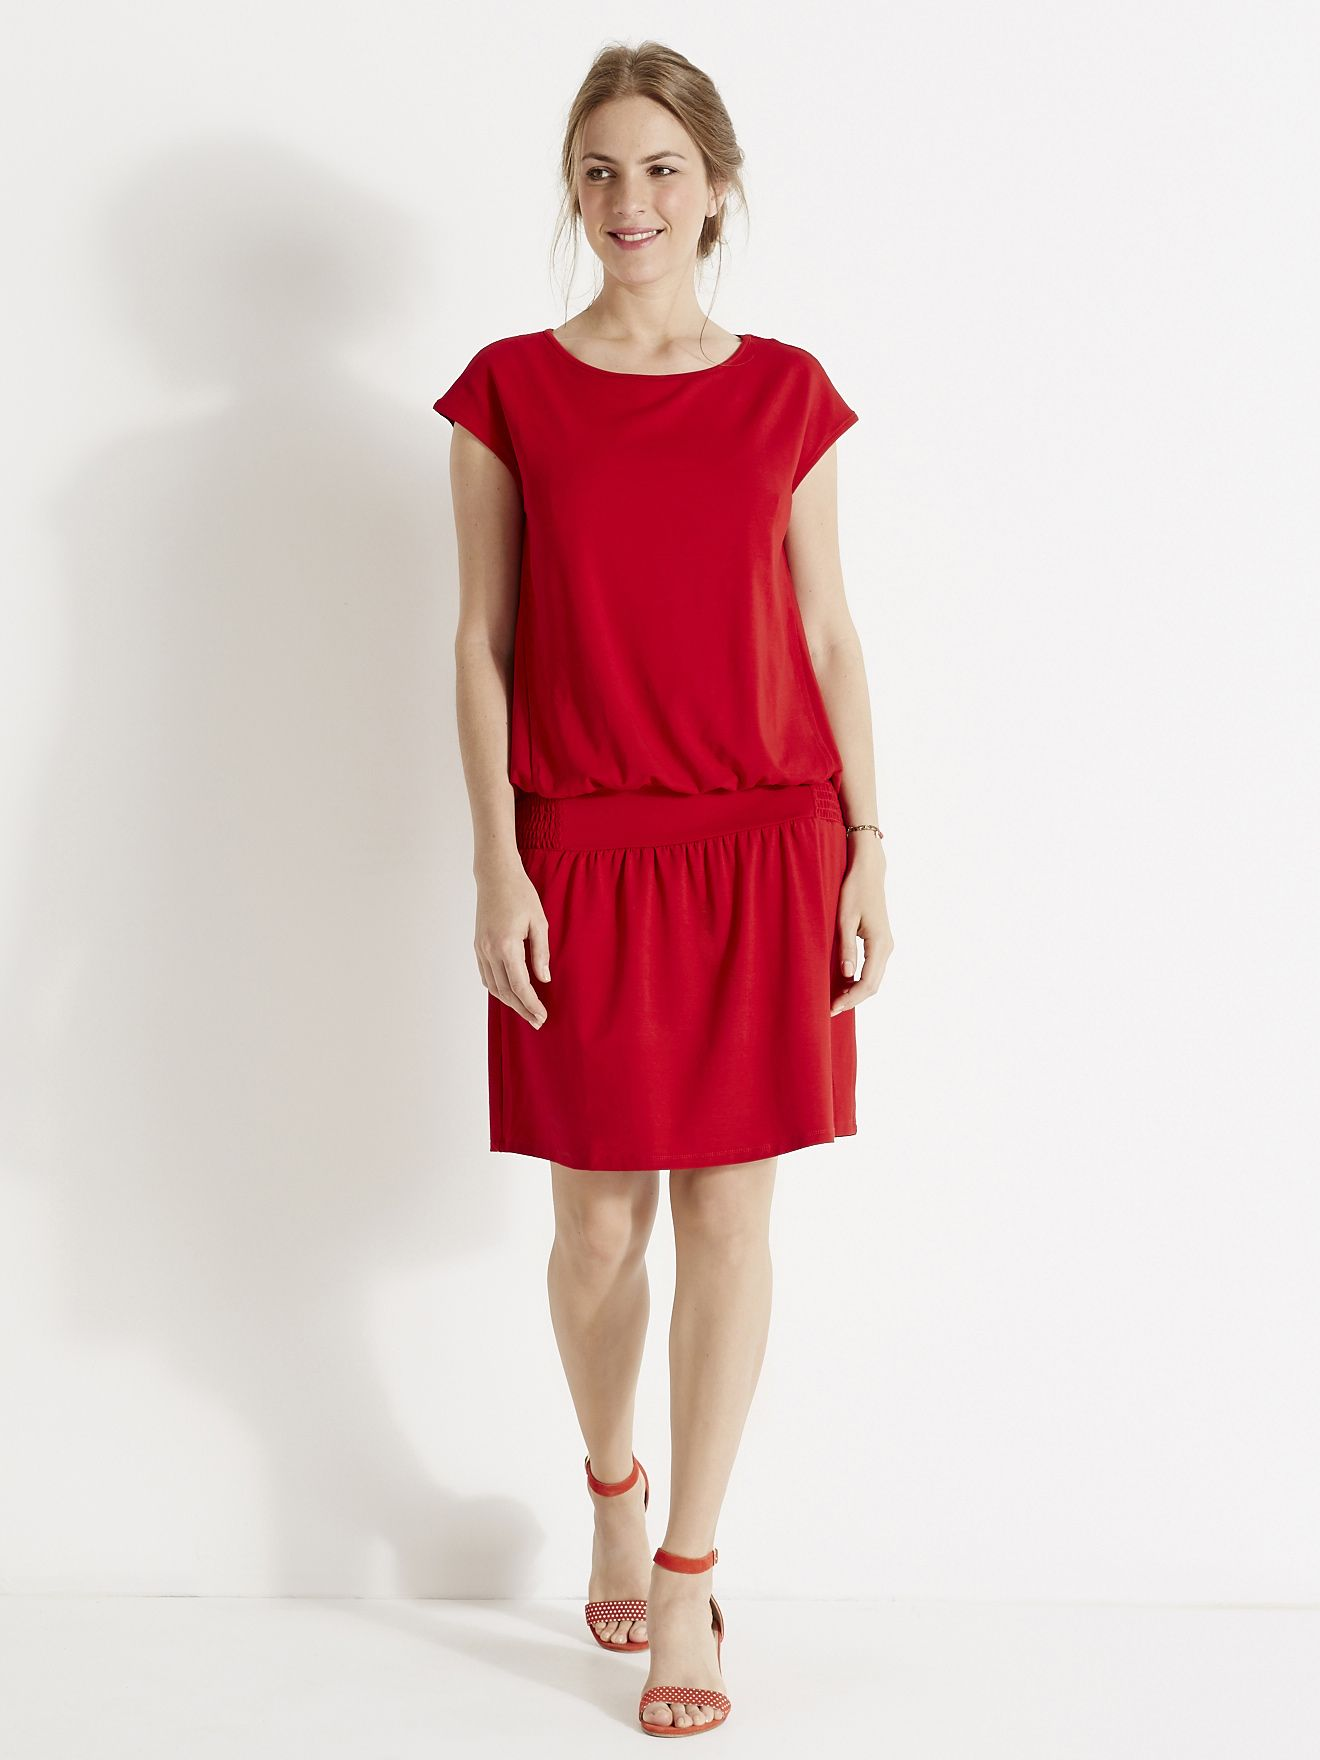 37198f165c Maternity Nursing Dress, Maternity Dresses, Occasion Dresses, Day Dresses,  Casual Dresses,